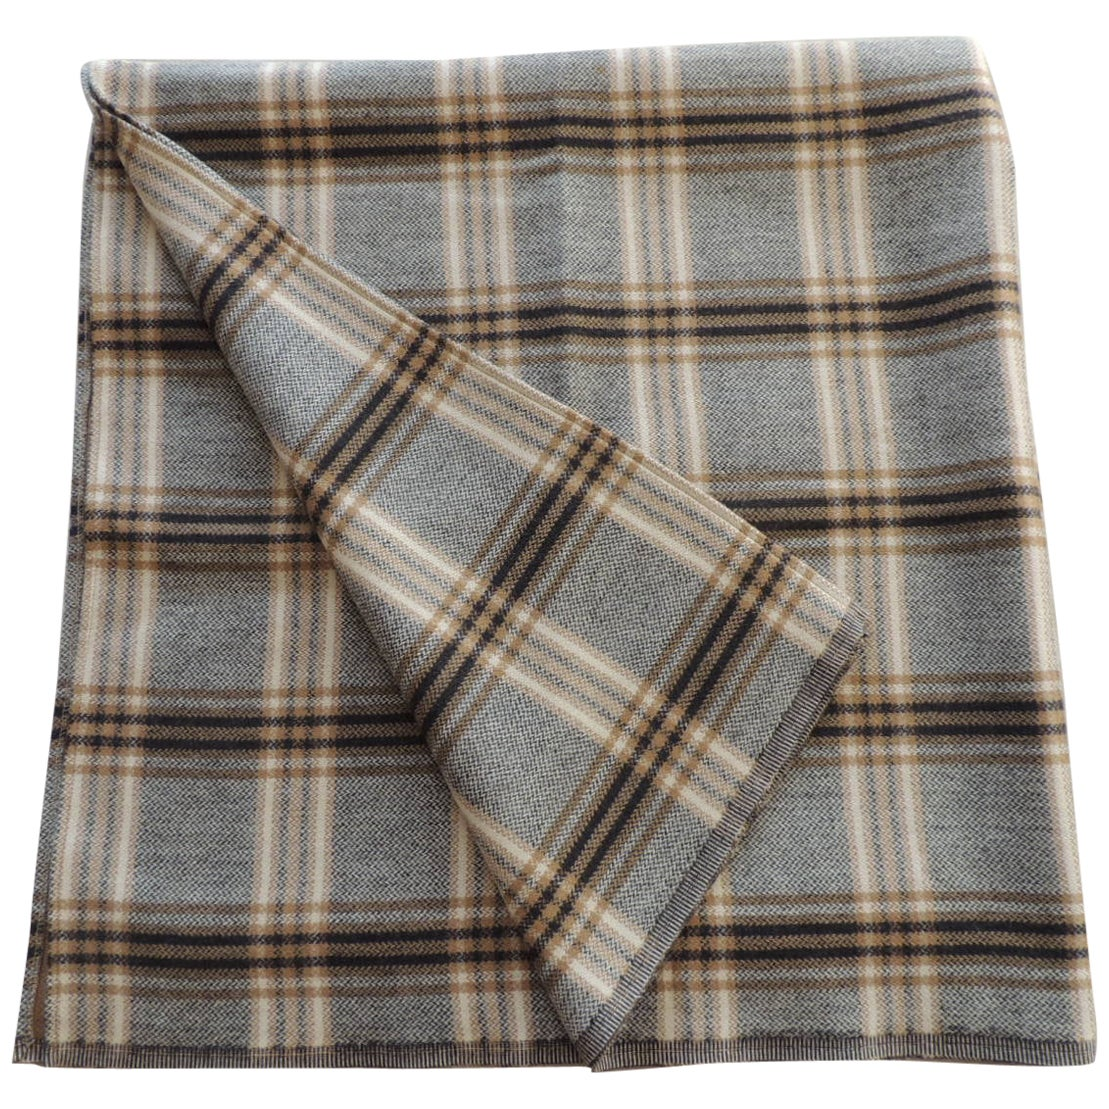 Vintage Grey and Tan Tartan Plaid Wool Decorative Throw